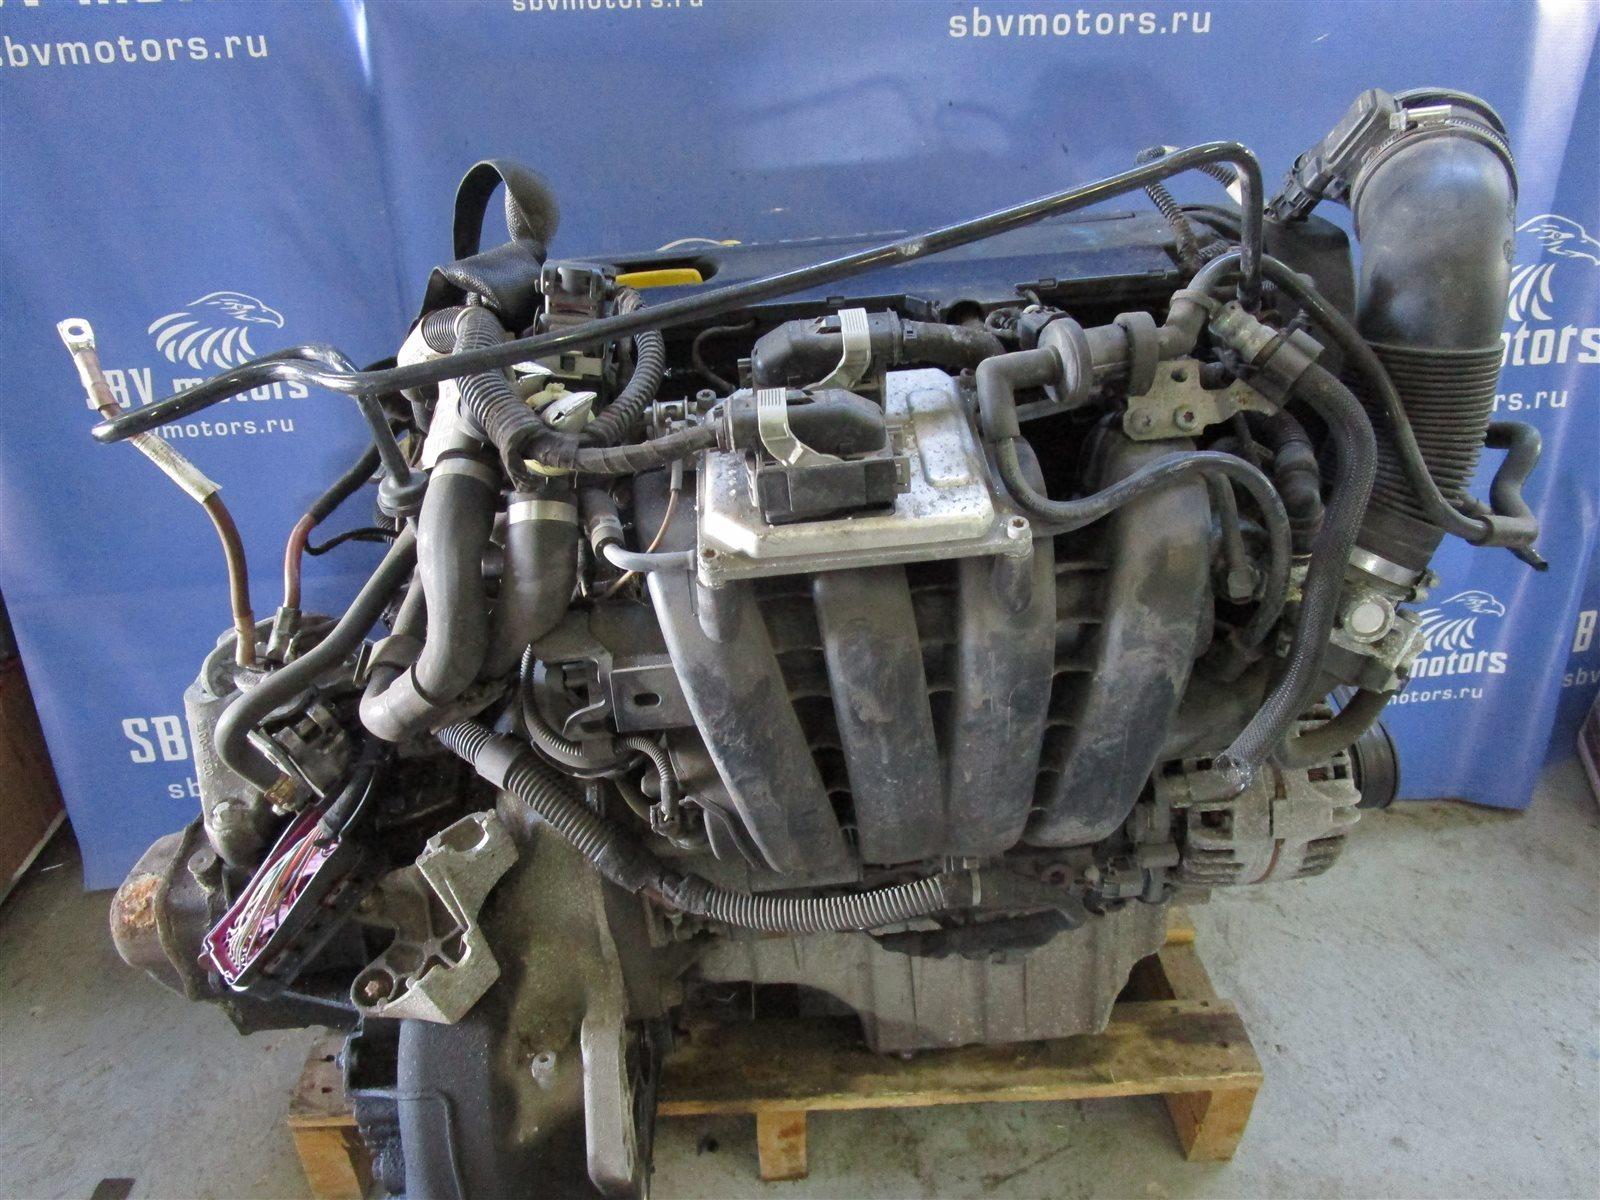 Двигатель Opel Zafira Z18XER 04.07.2007